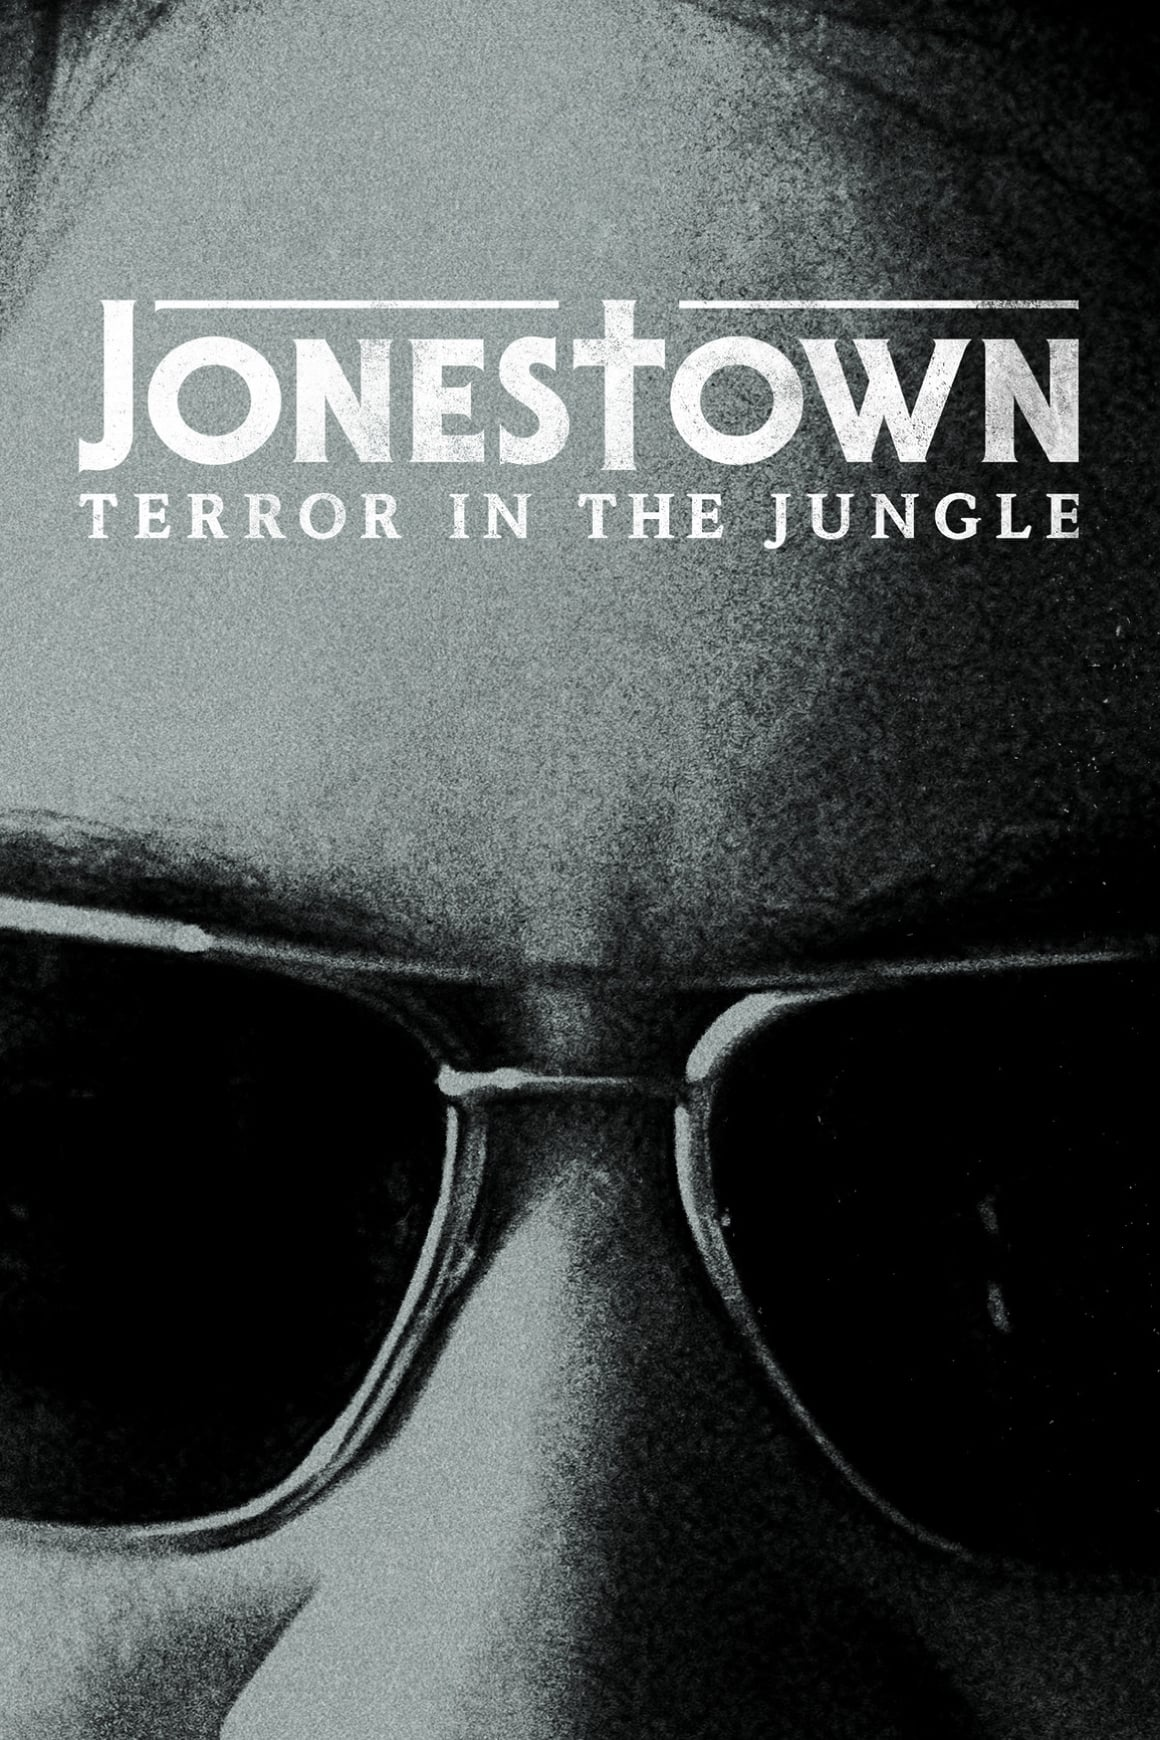 Jonestown: Terror in the Jungle Season 1